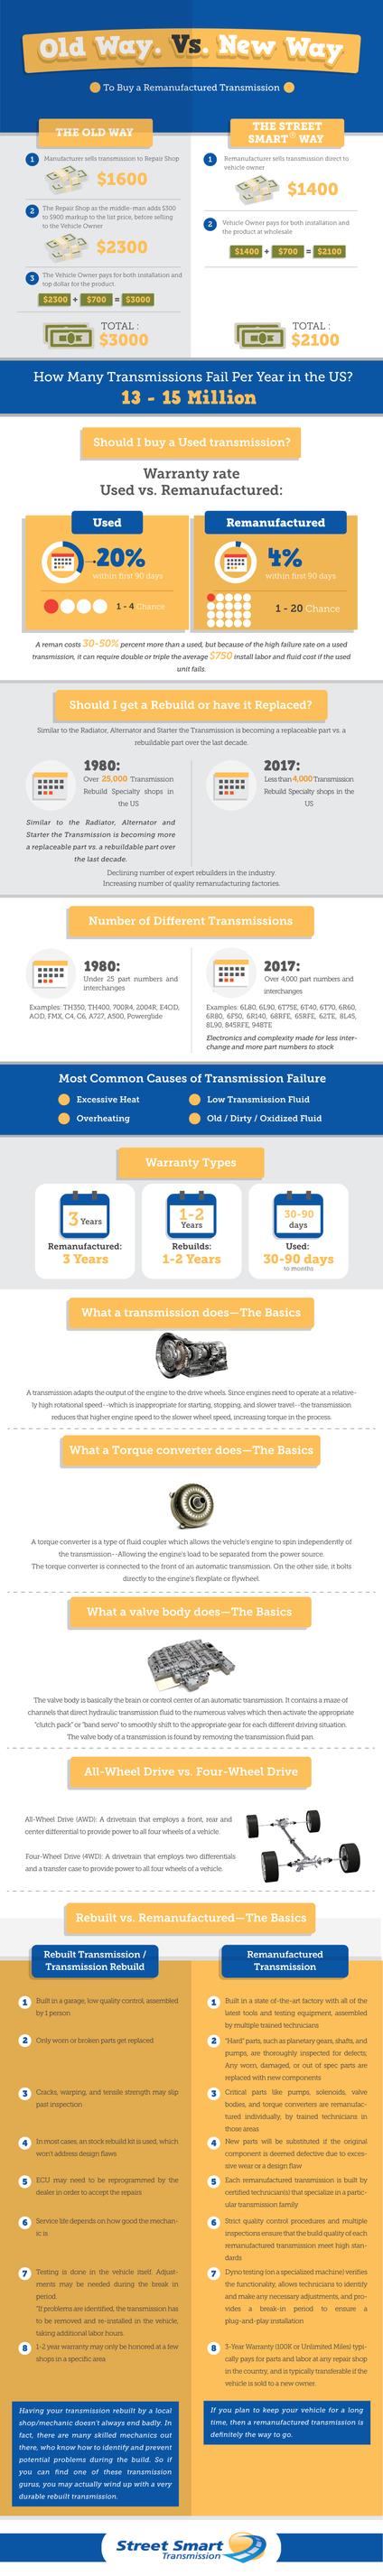 Transmission Torque Converter Clutch Solenoid | Street Smart